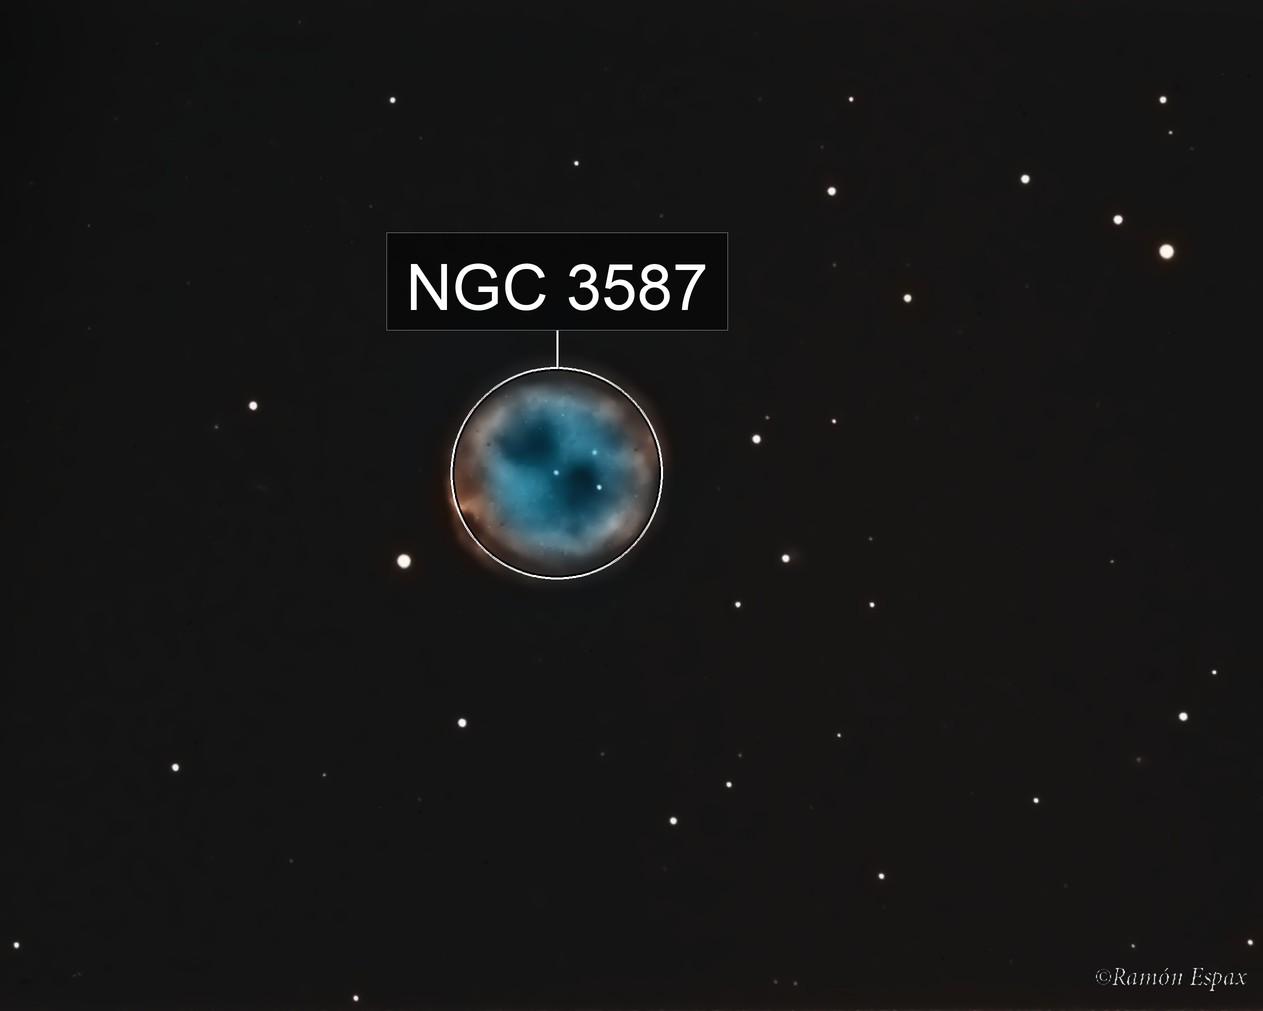 M97 - OWL NEBULA (HaOIII)